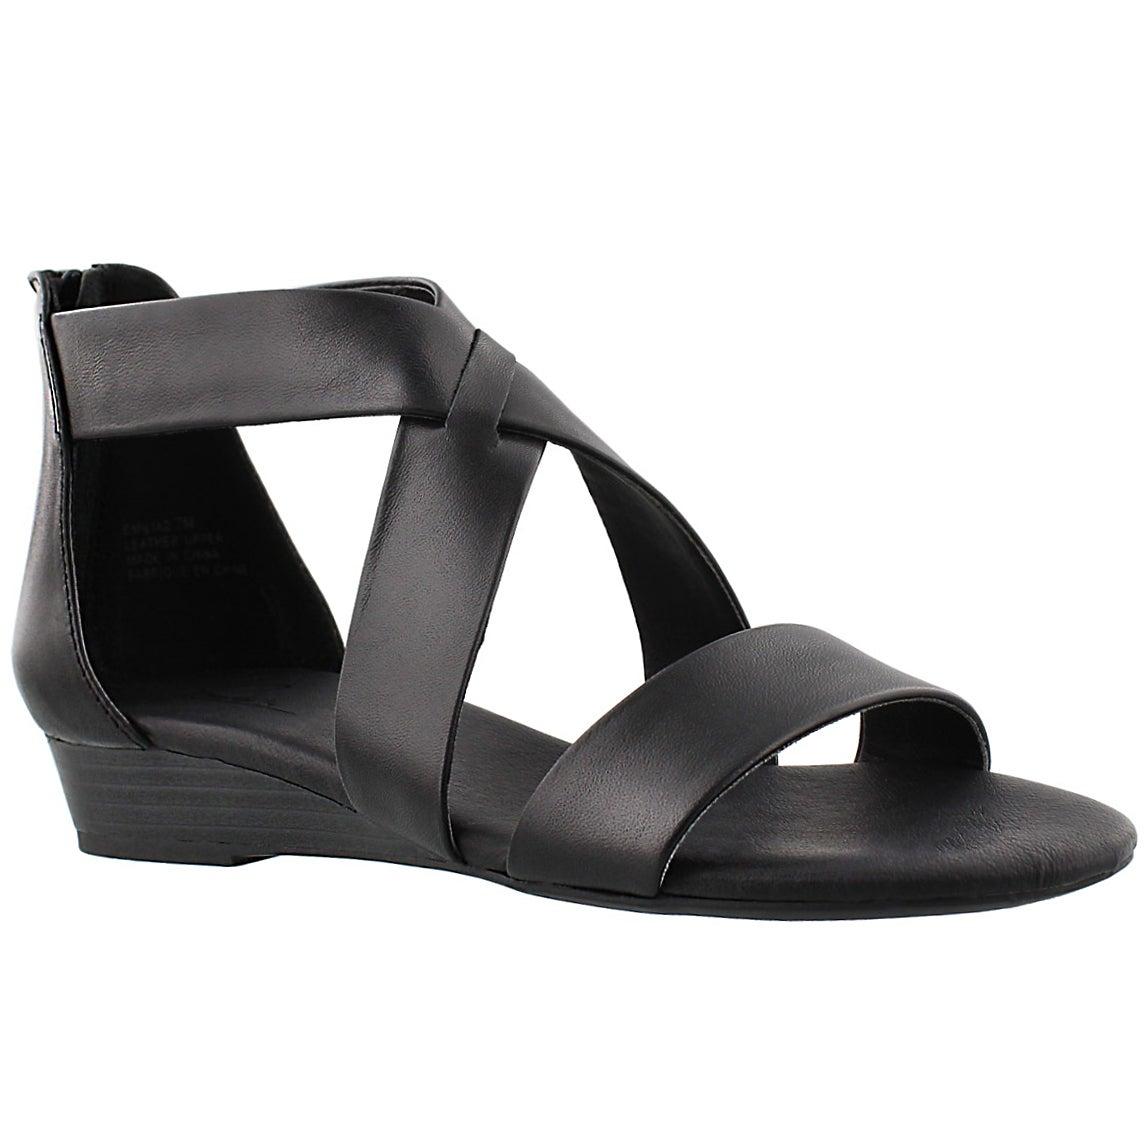 Lds Emilia 2 blk mem. foam sandal